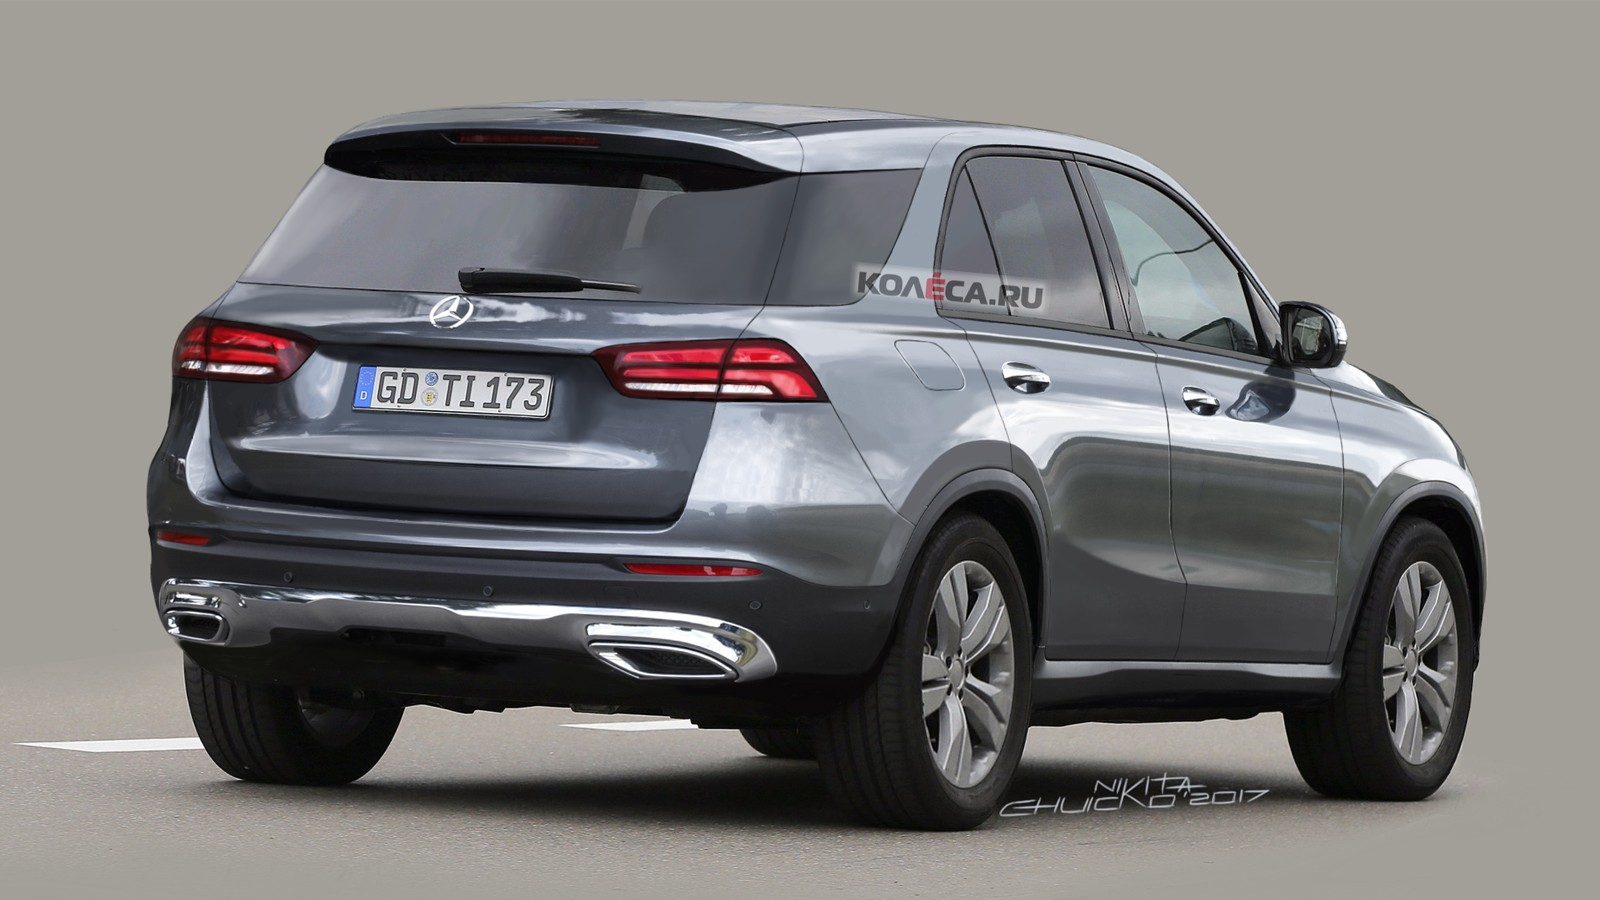 Mercedes GLE rear